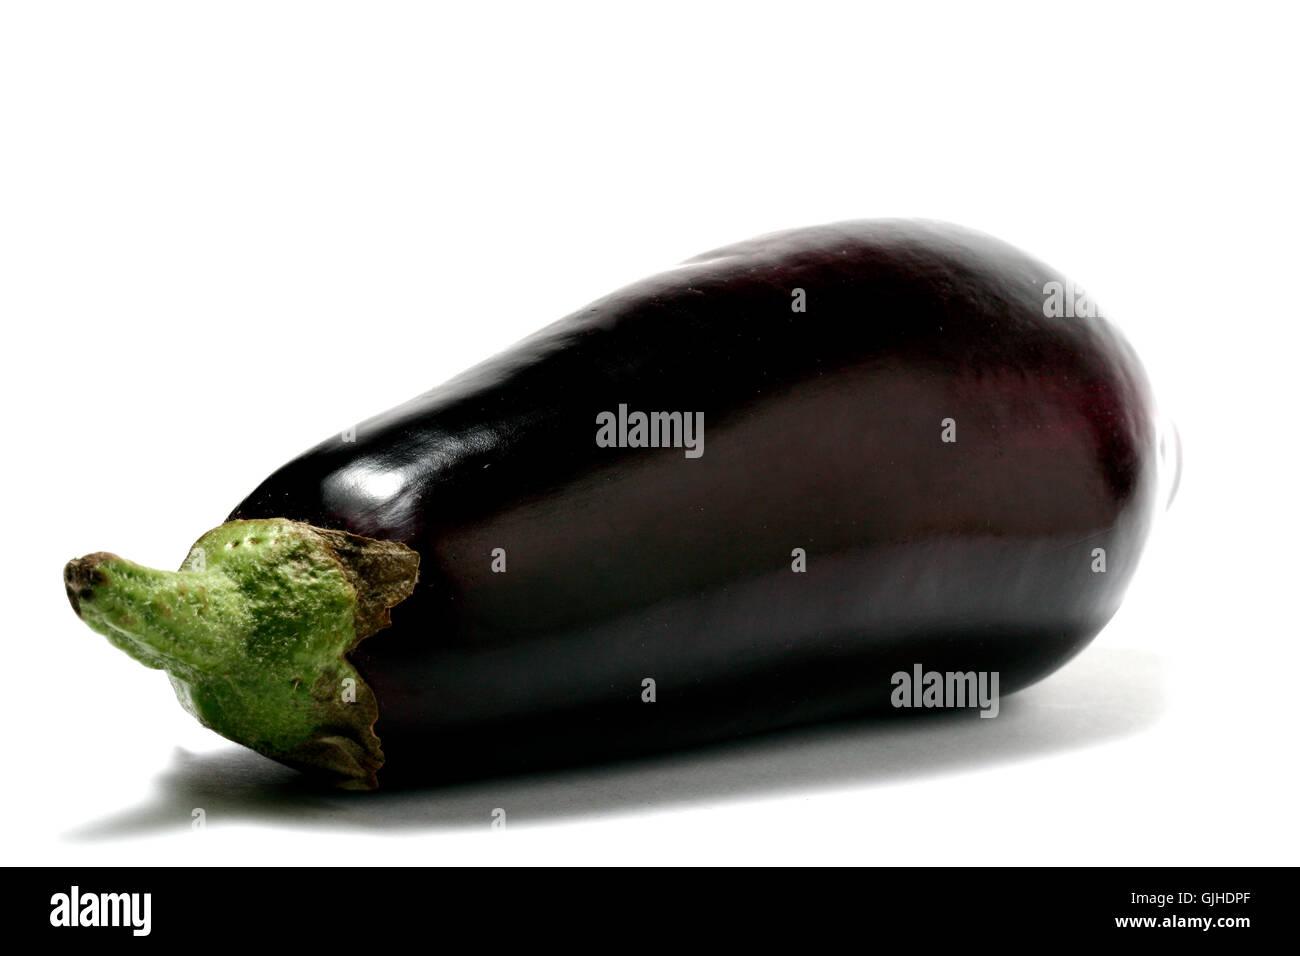 food aliment nourish - Stock Image